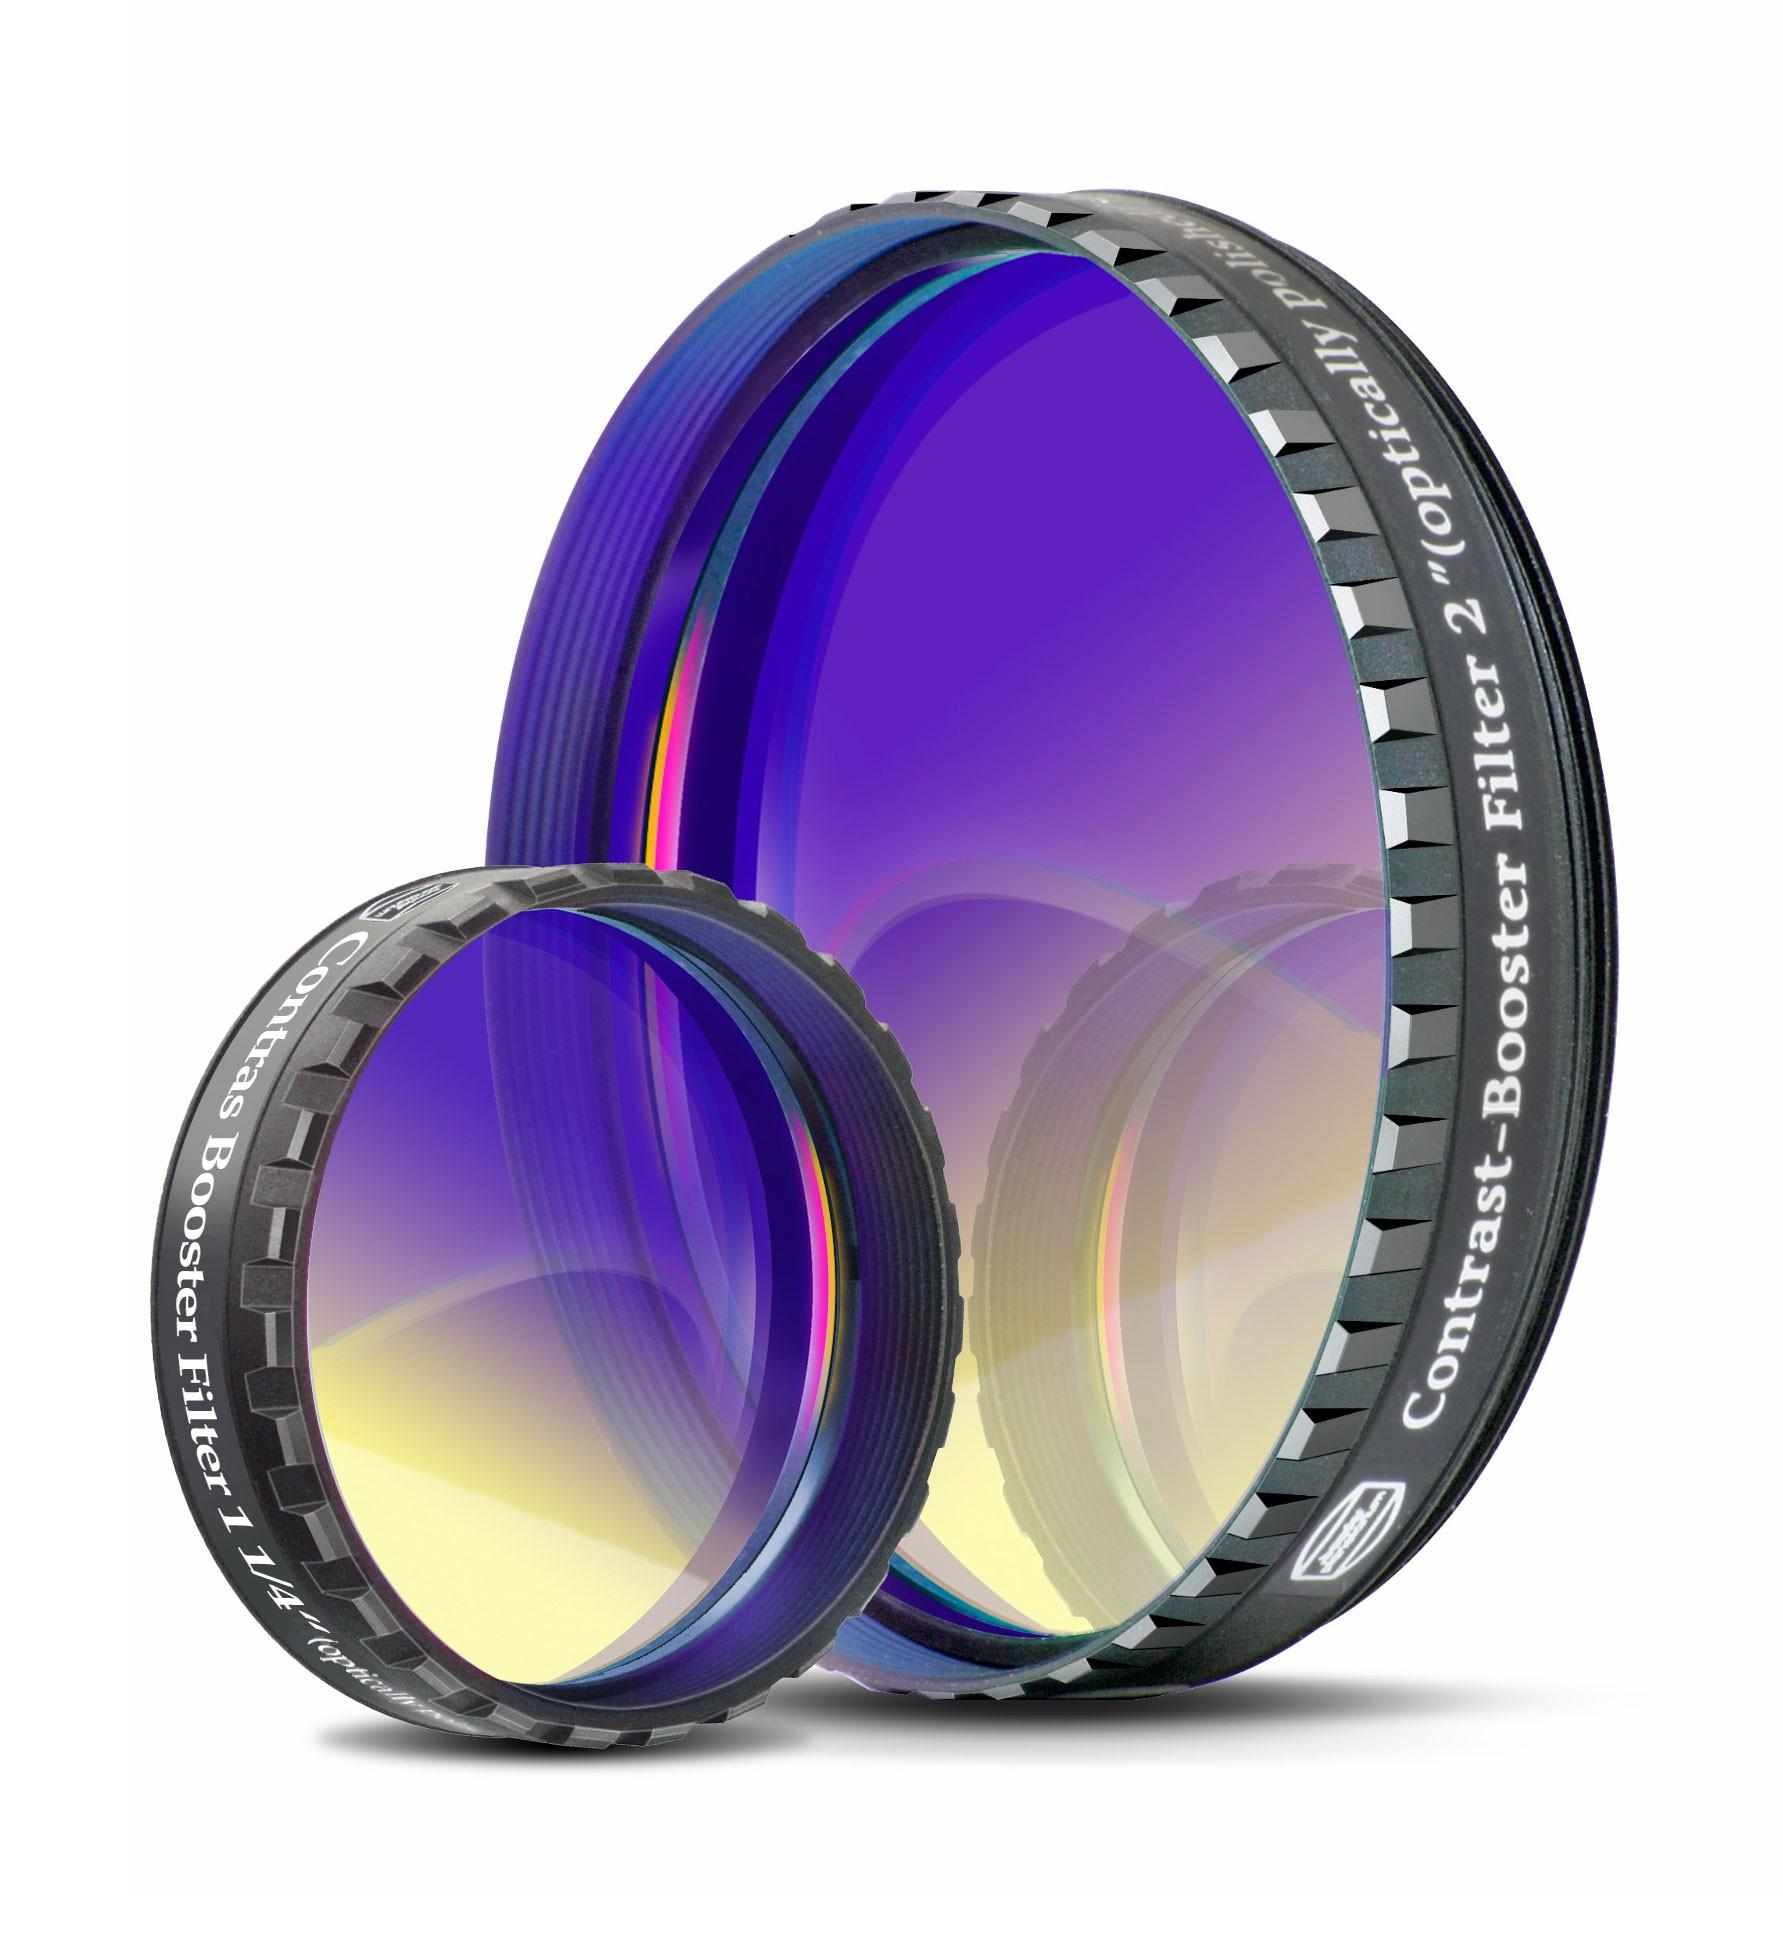 Baader Contrast Booster® Filter